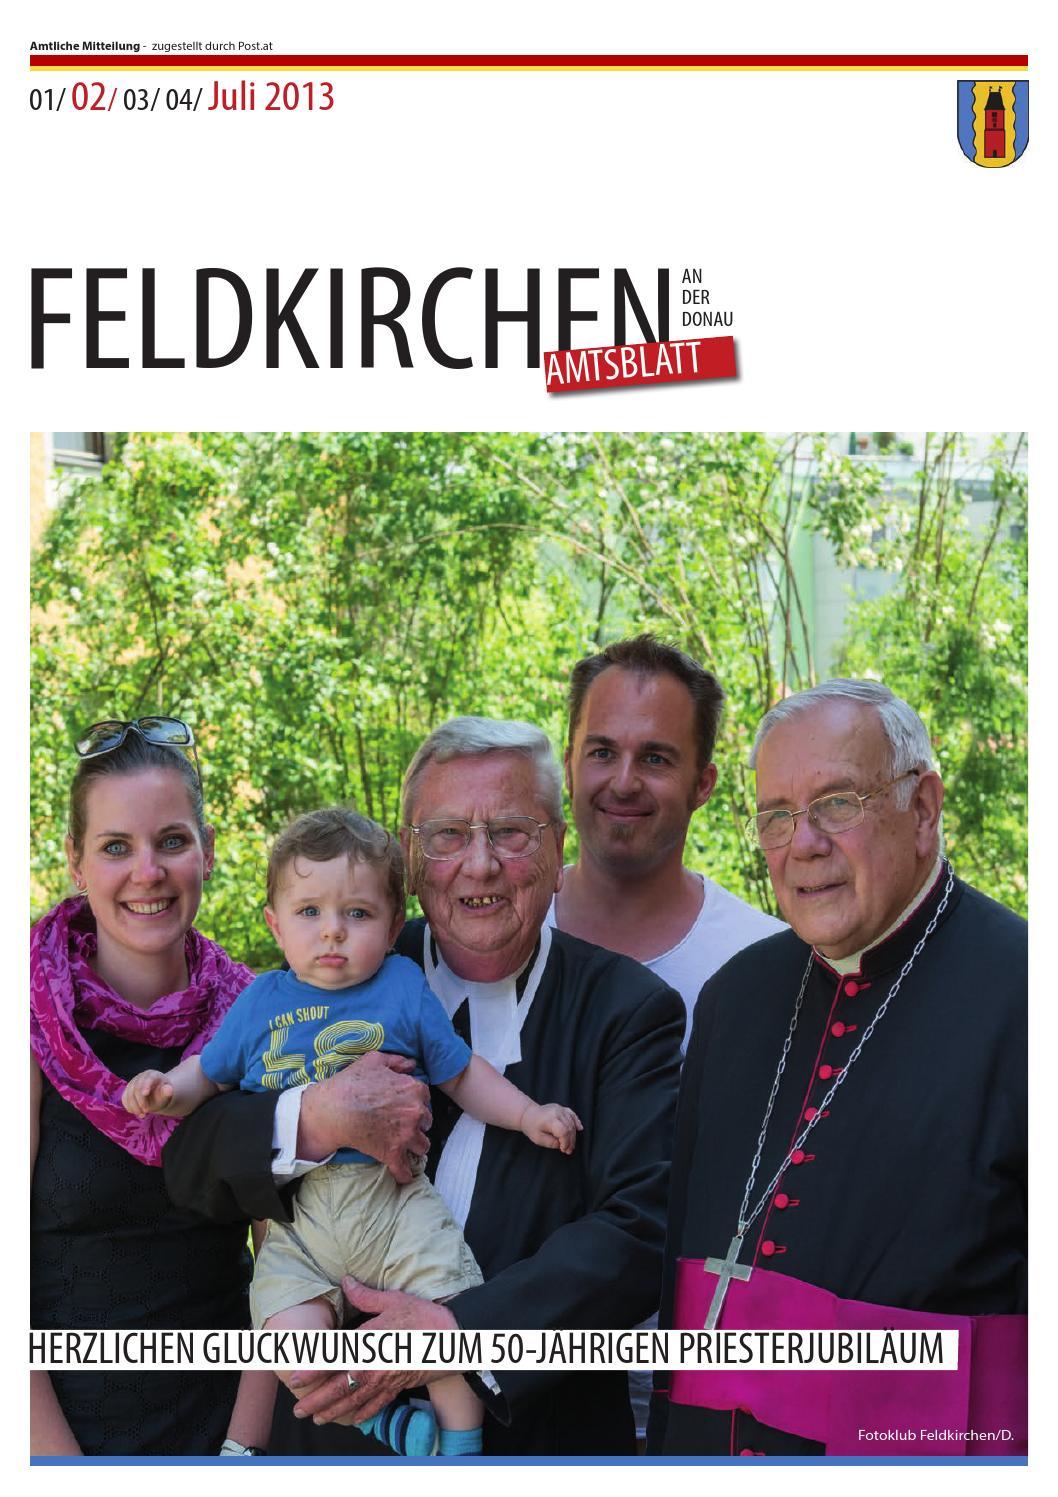 Feldkirchen an der donau neue bekanntschaften Partnervermittlung